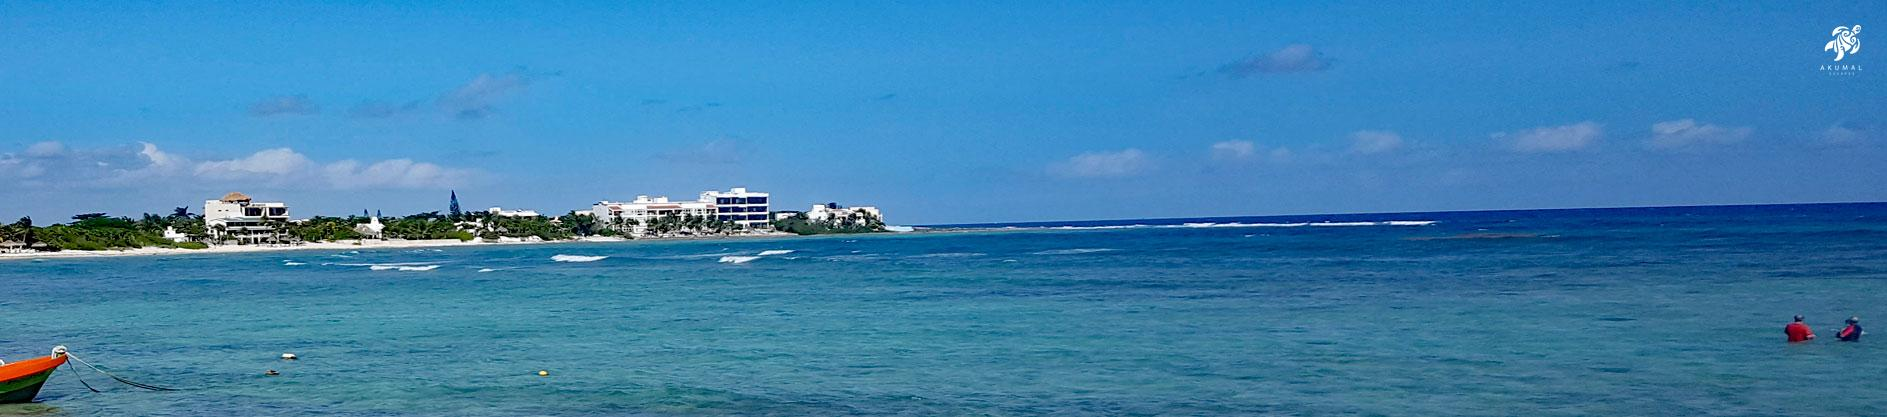 La Sirena from across Half Moon Bay